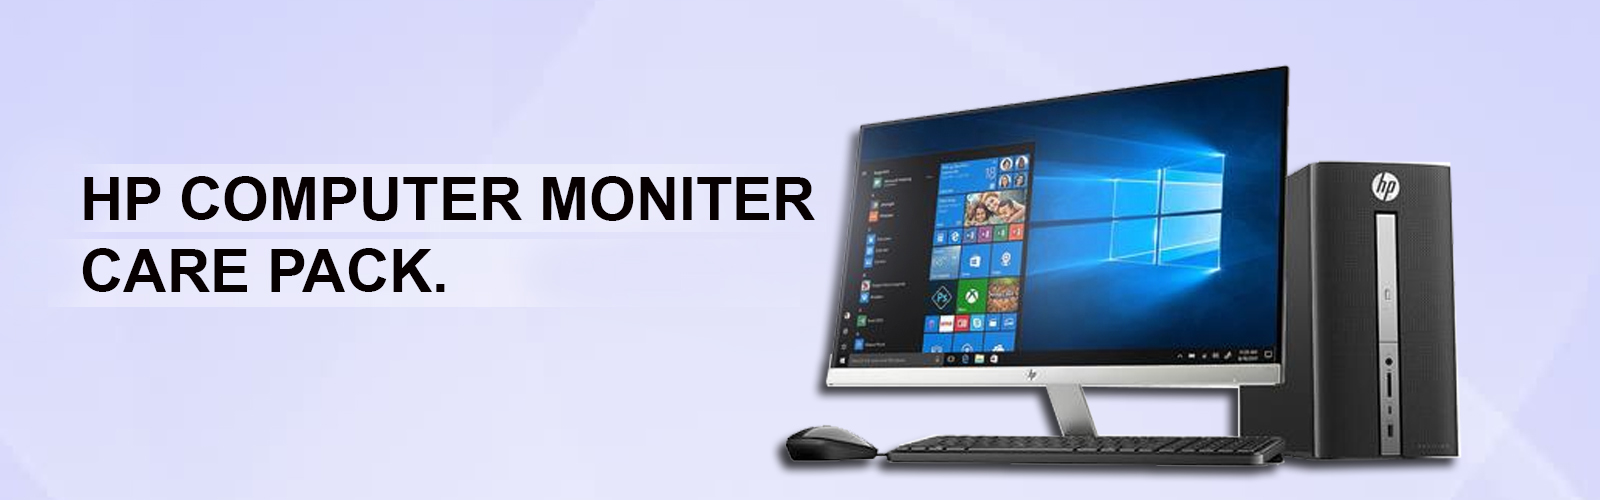 HP Computer Monitor Care Pack Delhi